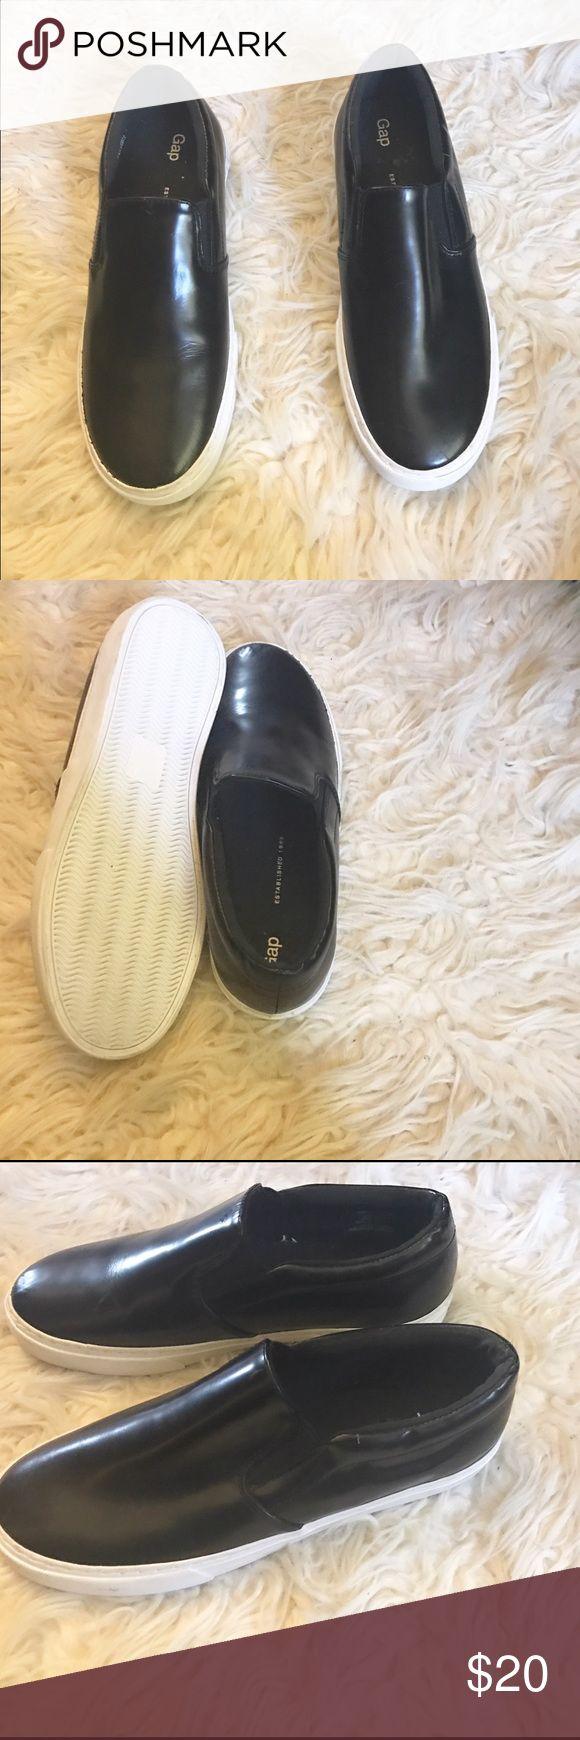 Selling this Brand New Gap women's slip on shoes on Poshmark! My username is: dream_13. #shopmycloset #poshmark #fashion #shopping #style #forsale #GAP #Shoes